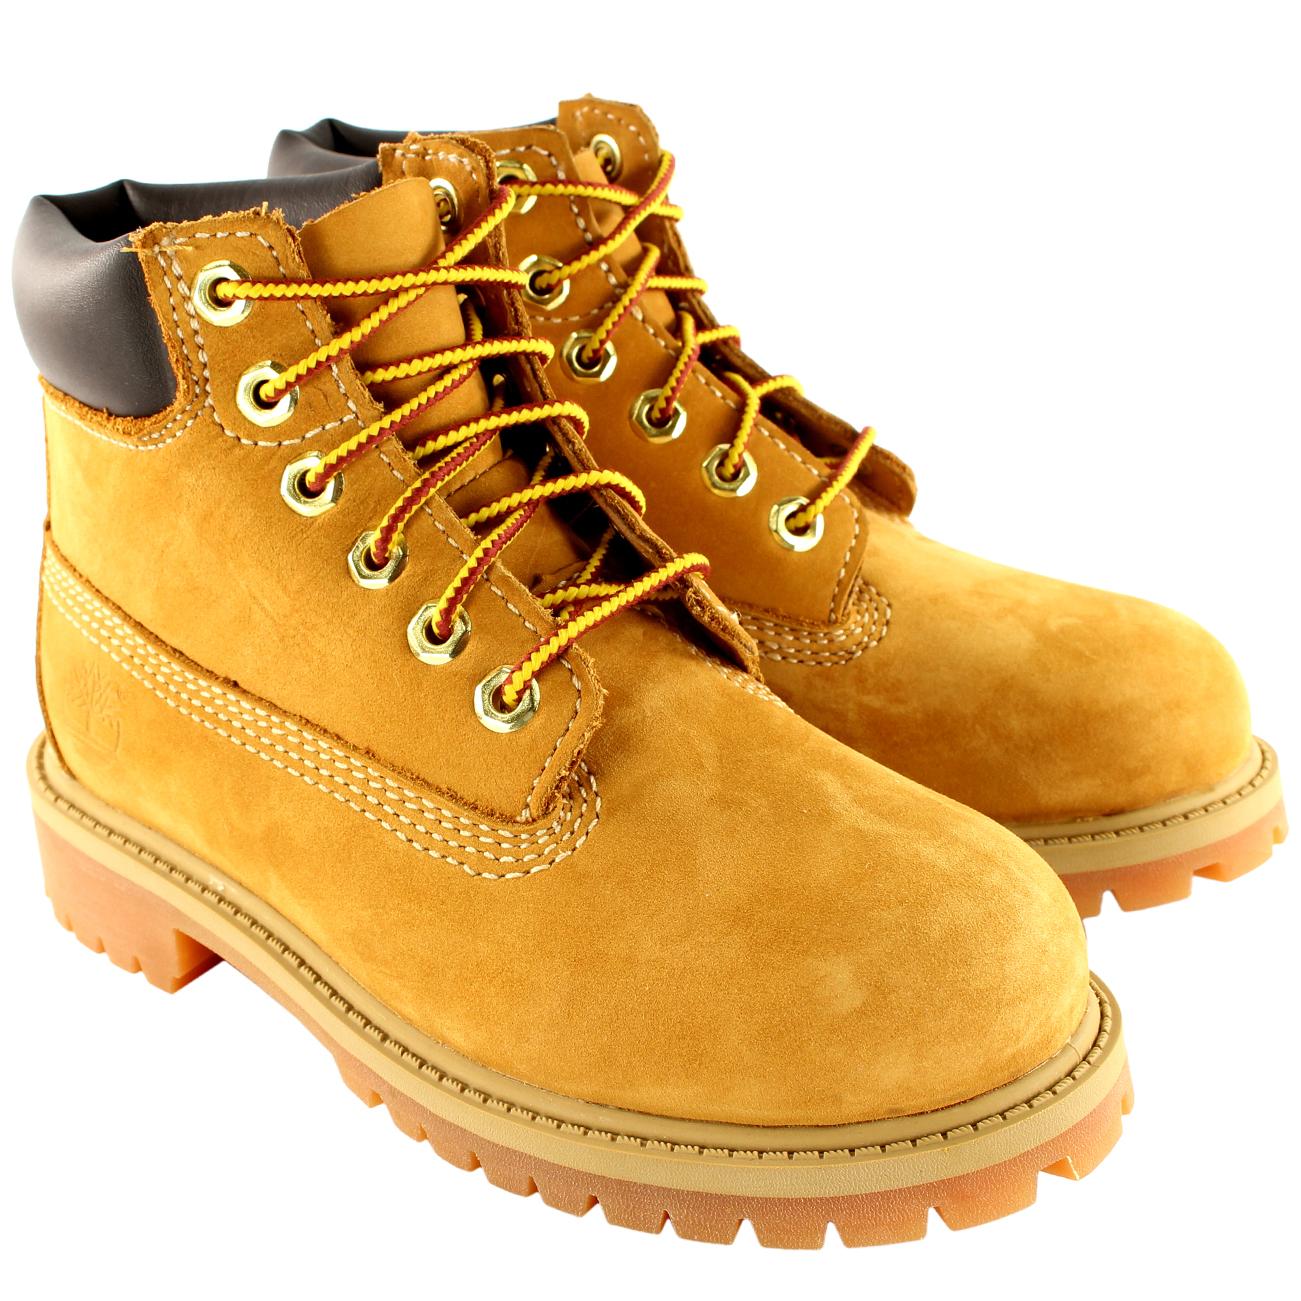 "Unisex Kids Timberland Classic 6"" Original Wheat Boots"